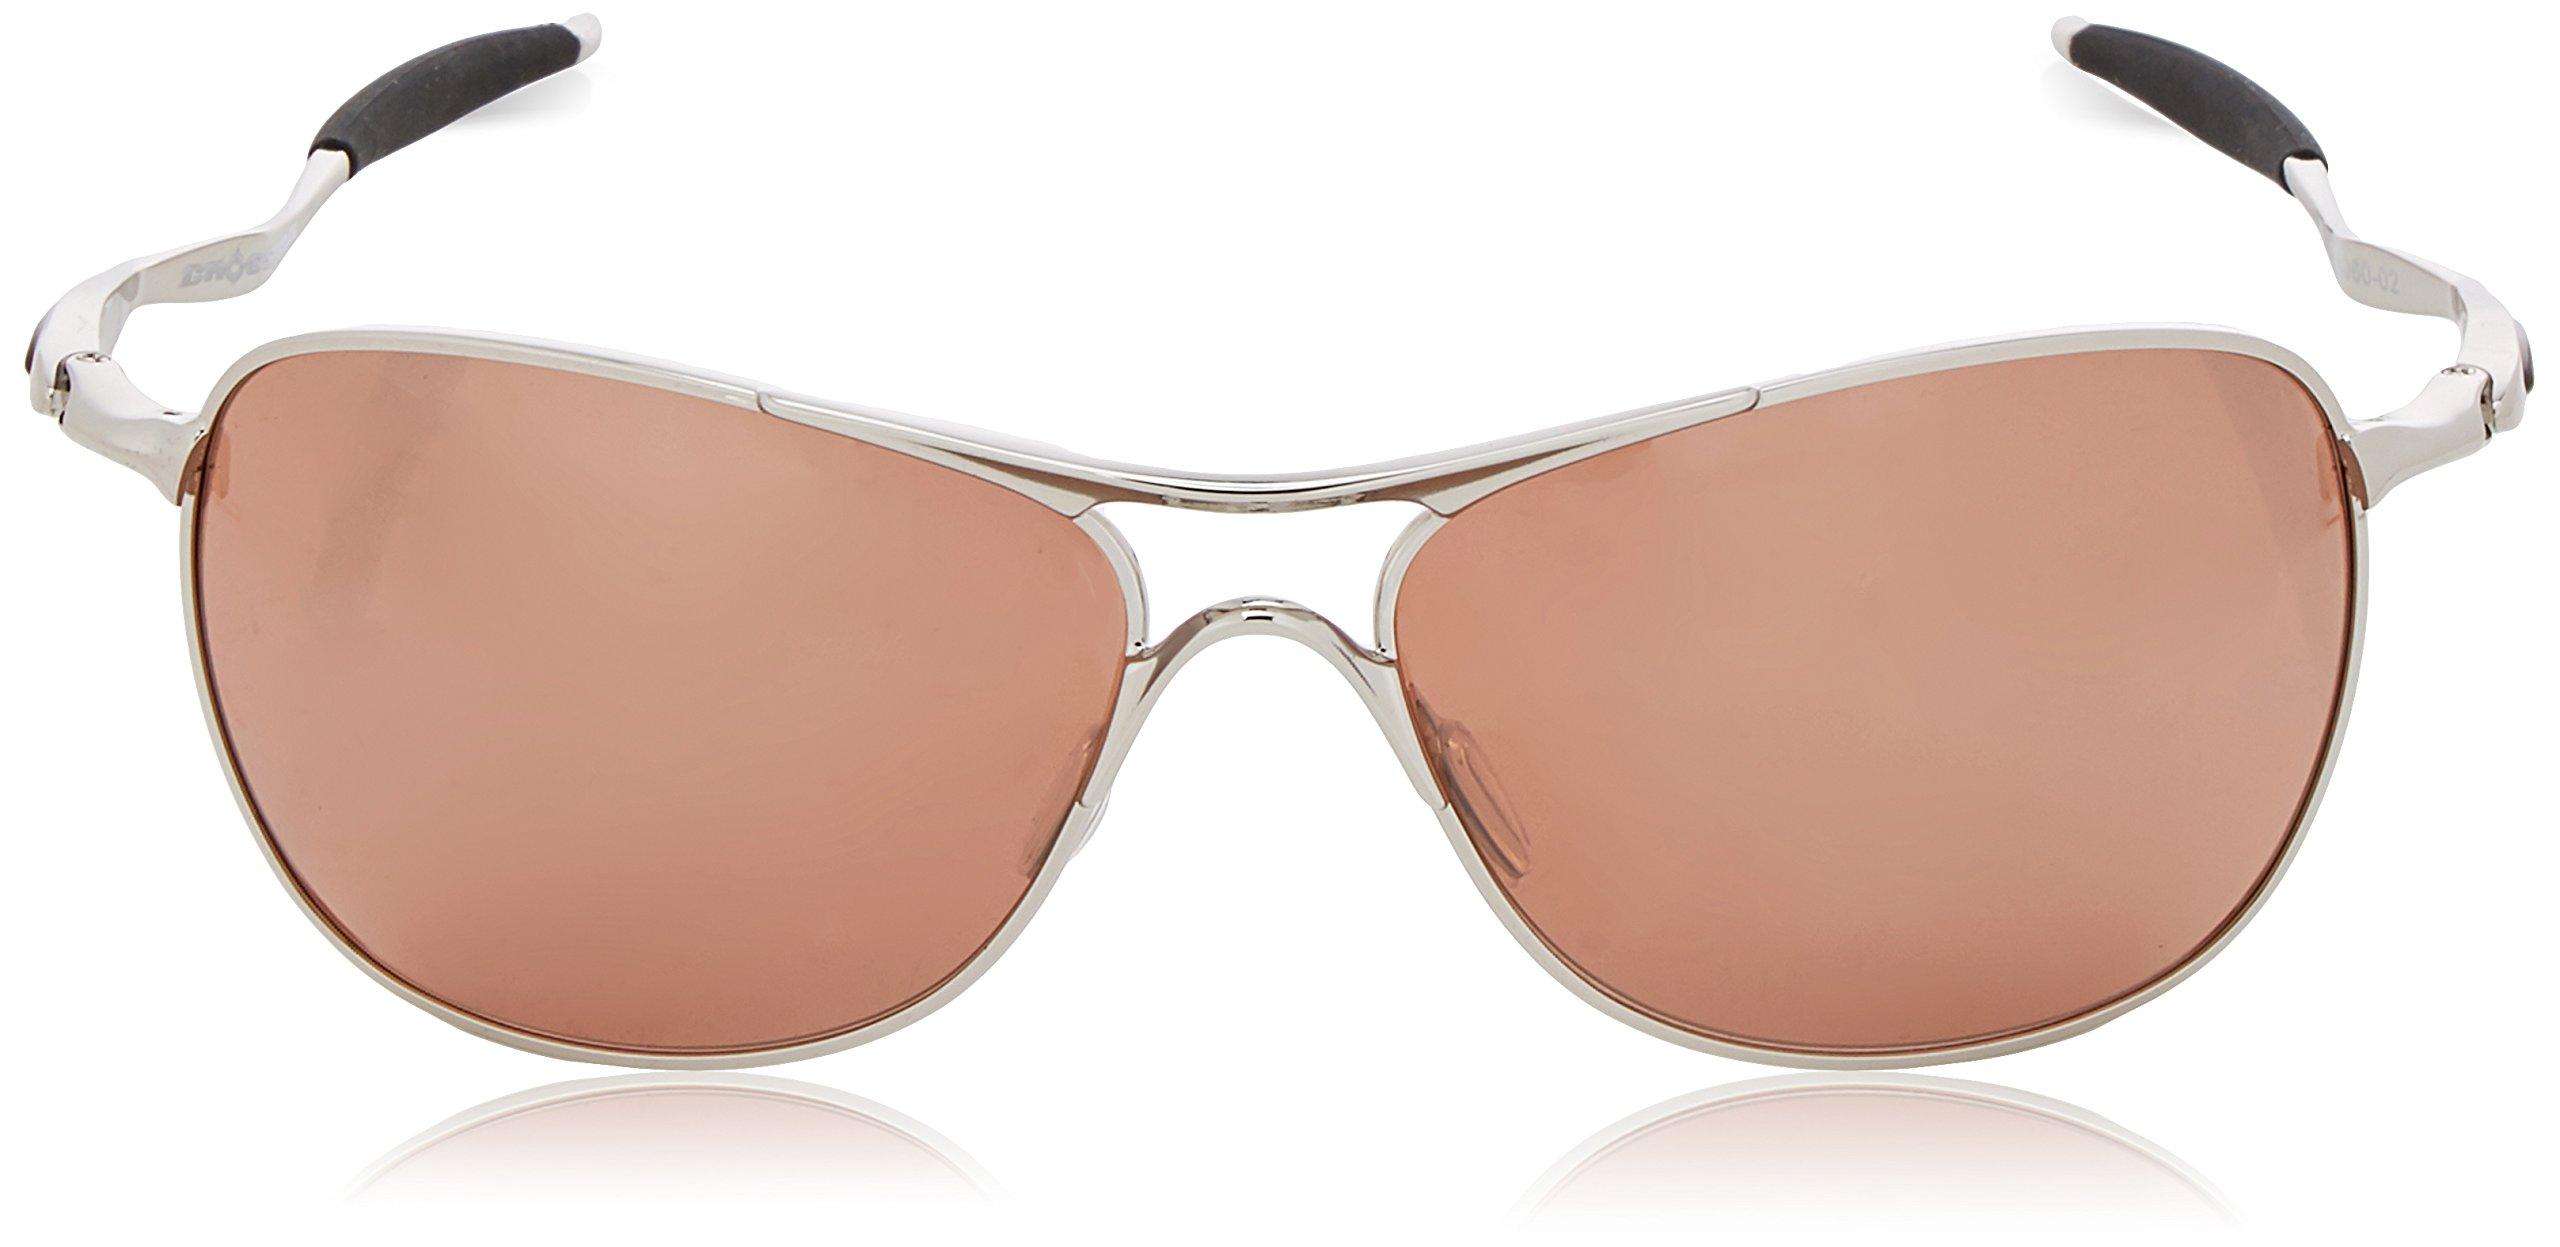 Oakley Mens Crosshair OO4060-02 Iridium Non-Polarized Oval Sunglasses,Chrome Frame/VR28 Black Iridium Lens,one size by Oakley (Image #2)